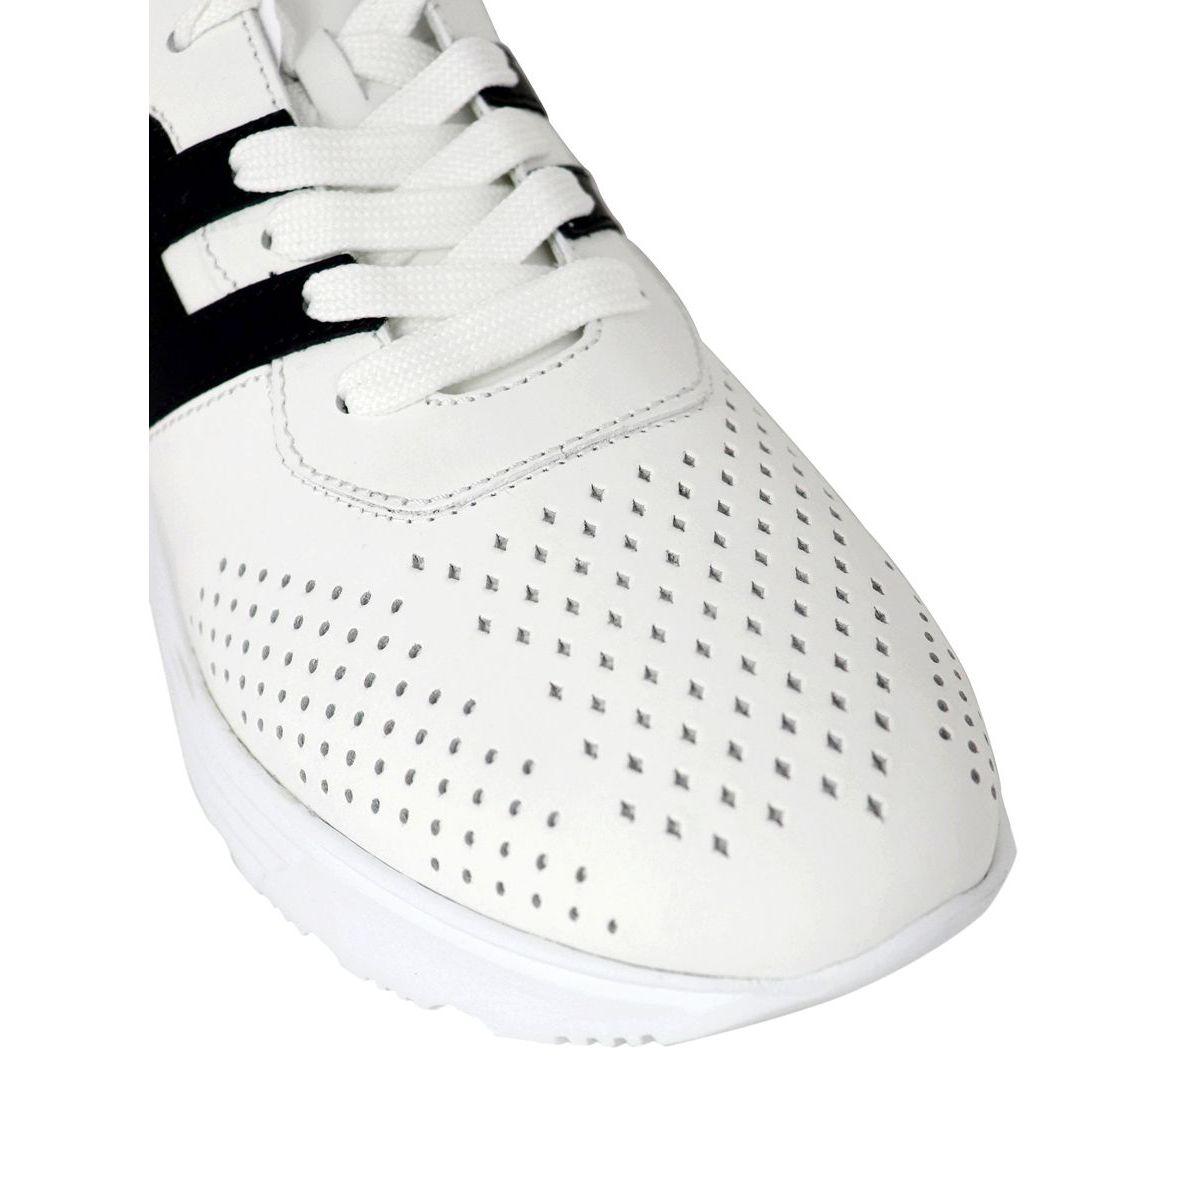 FONDO 443 sneakers White black Hogan